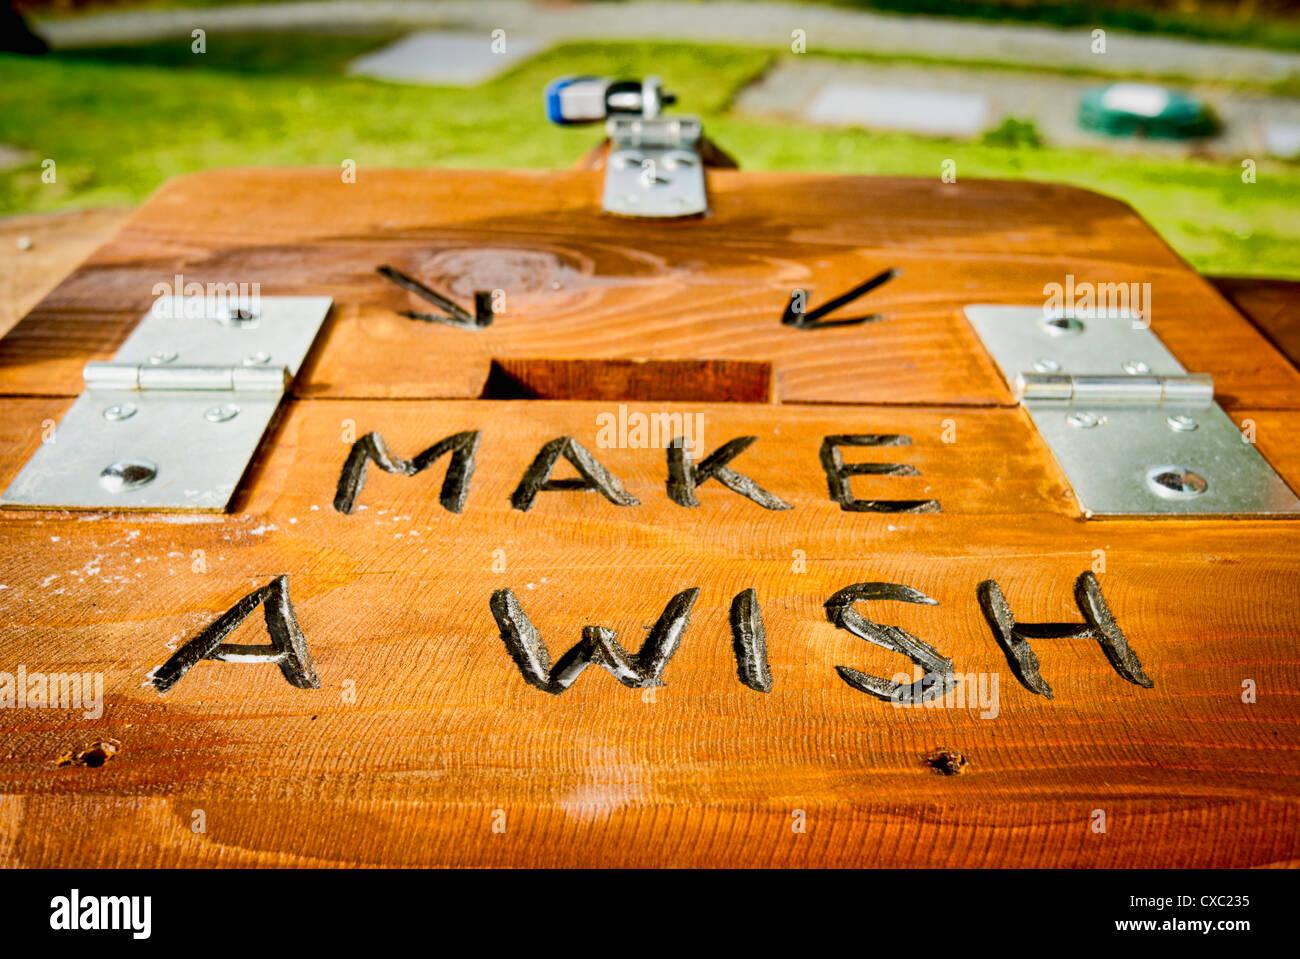 MAKE A WISH plea on fund-raising wishing well - Stock Image